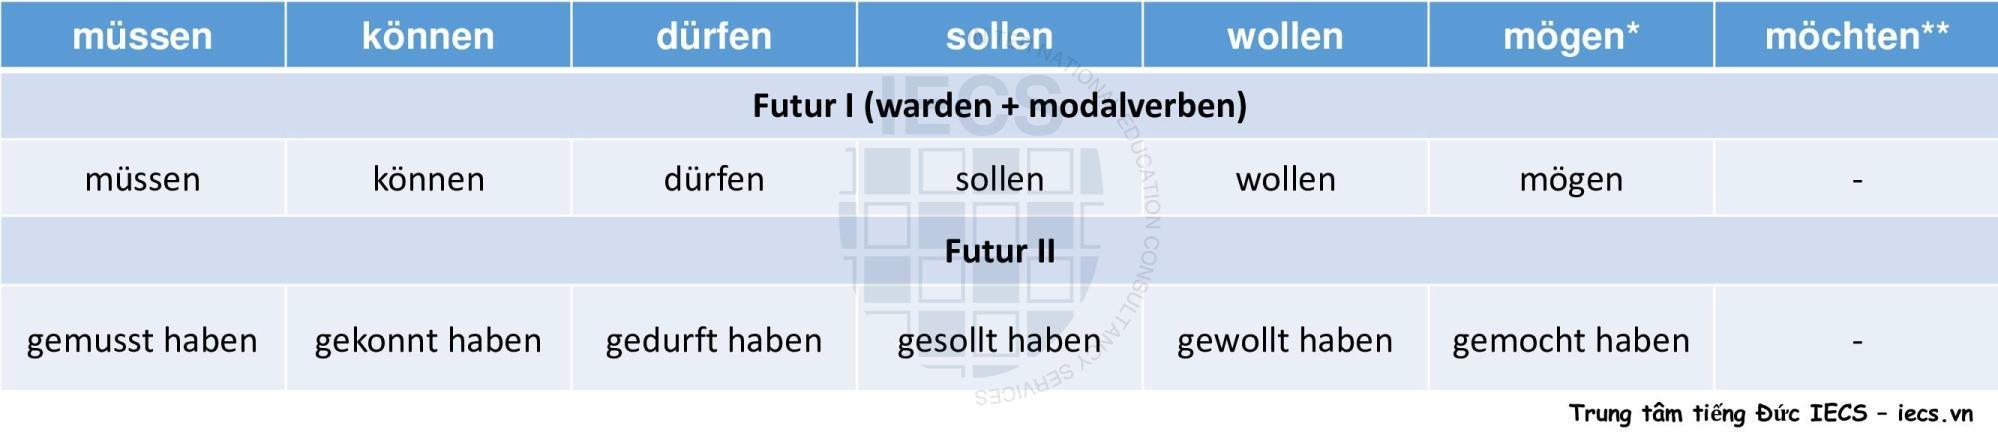 Modalverben-Futur I-Futur II